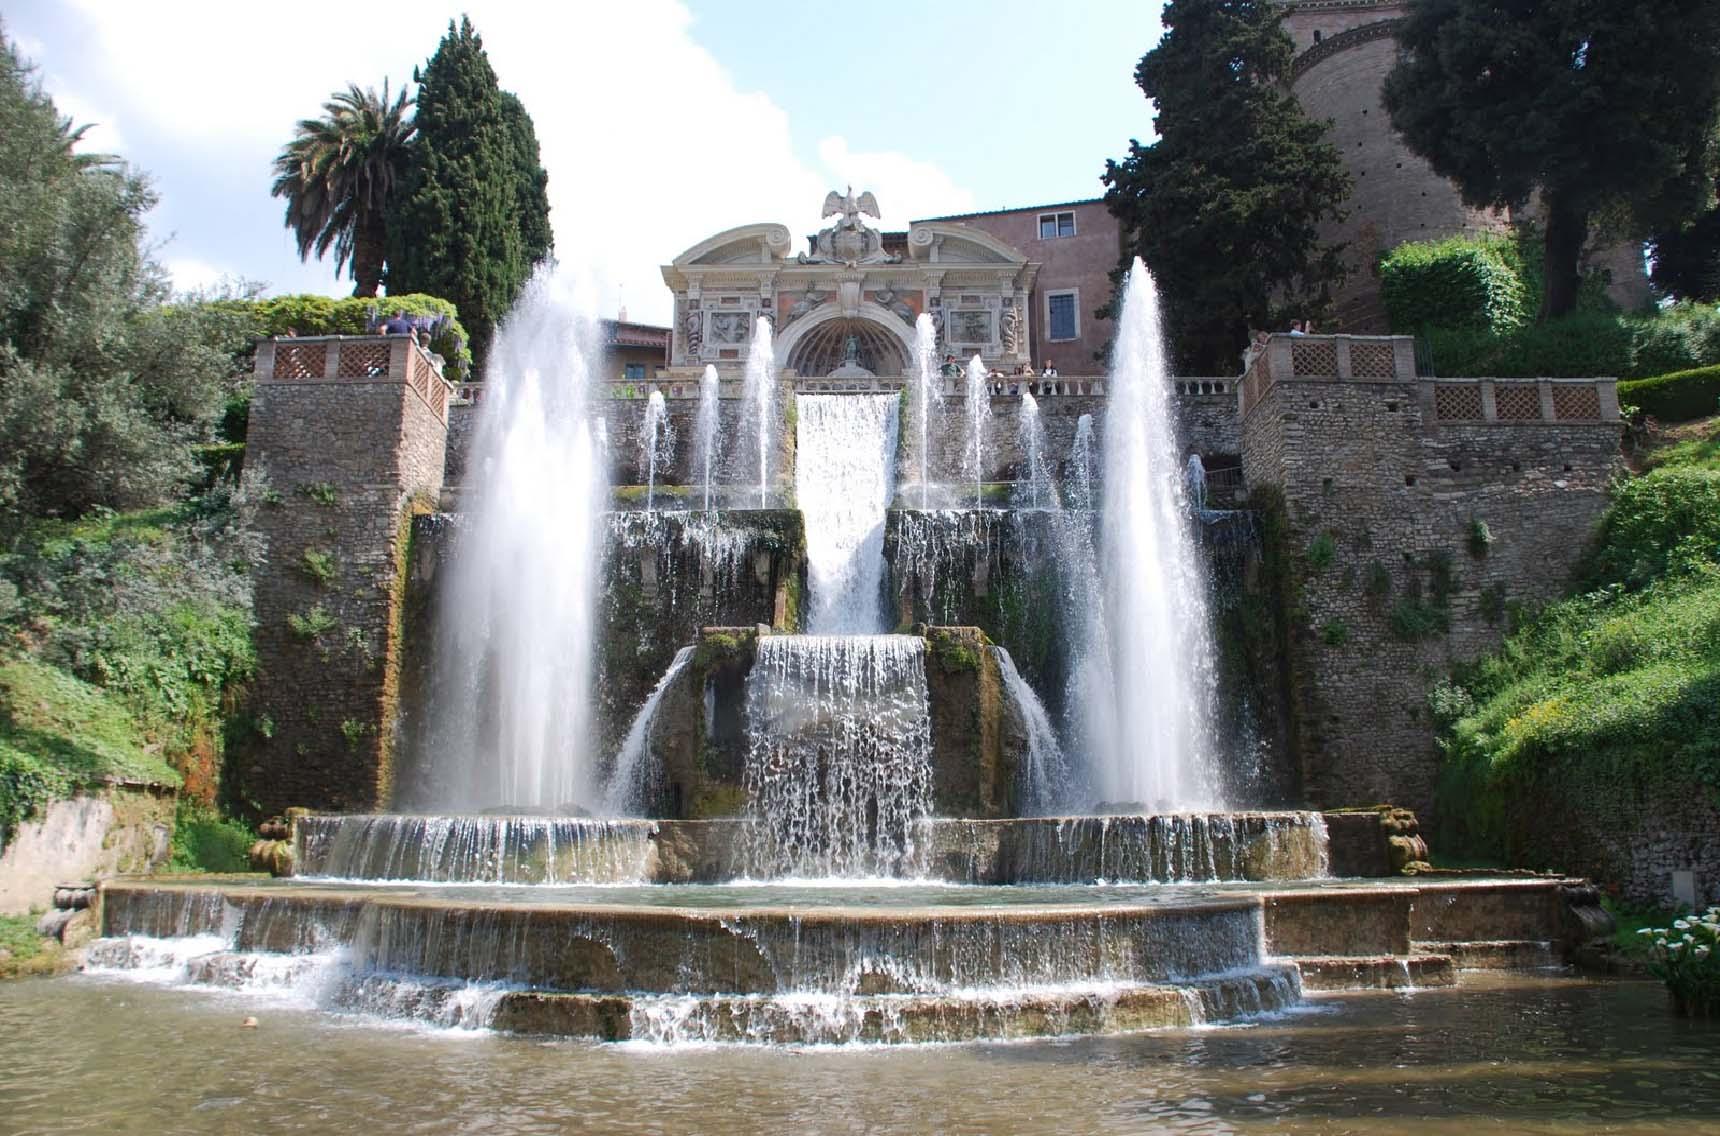 Italy Best Excursions Villa DEste and Villa Adriana Private DayTour from Rome